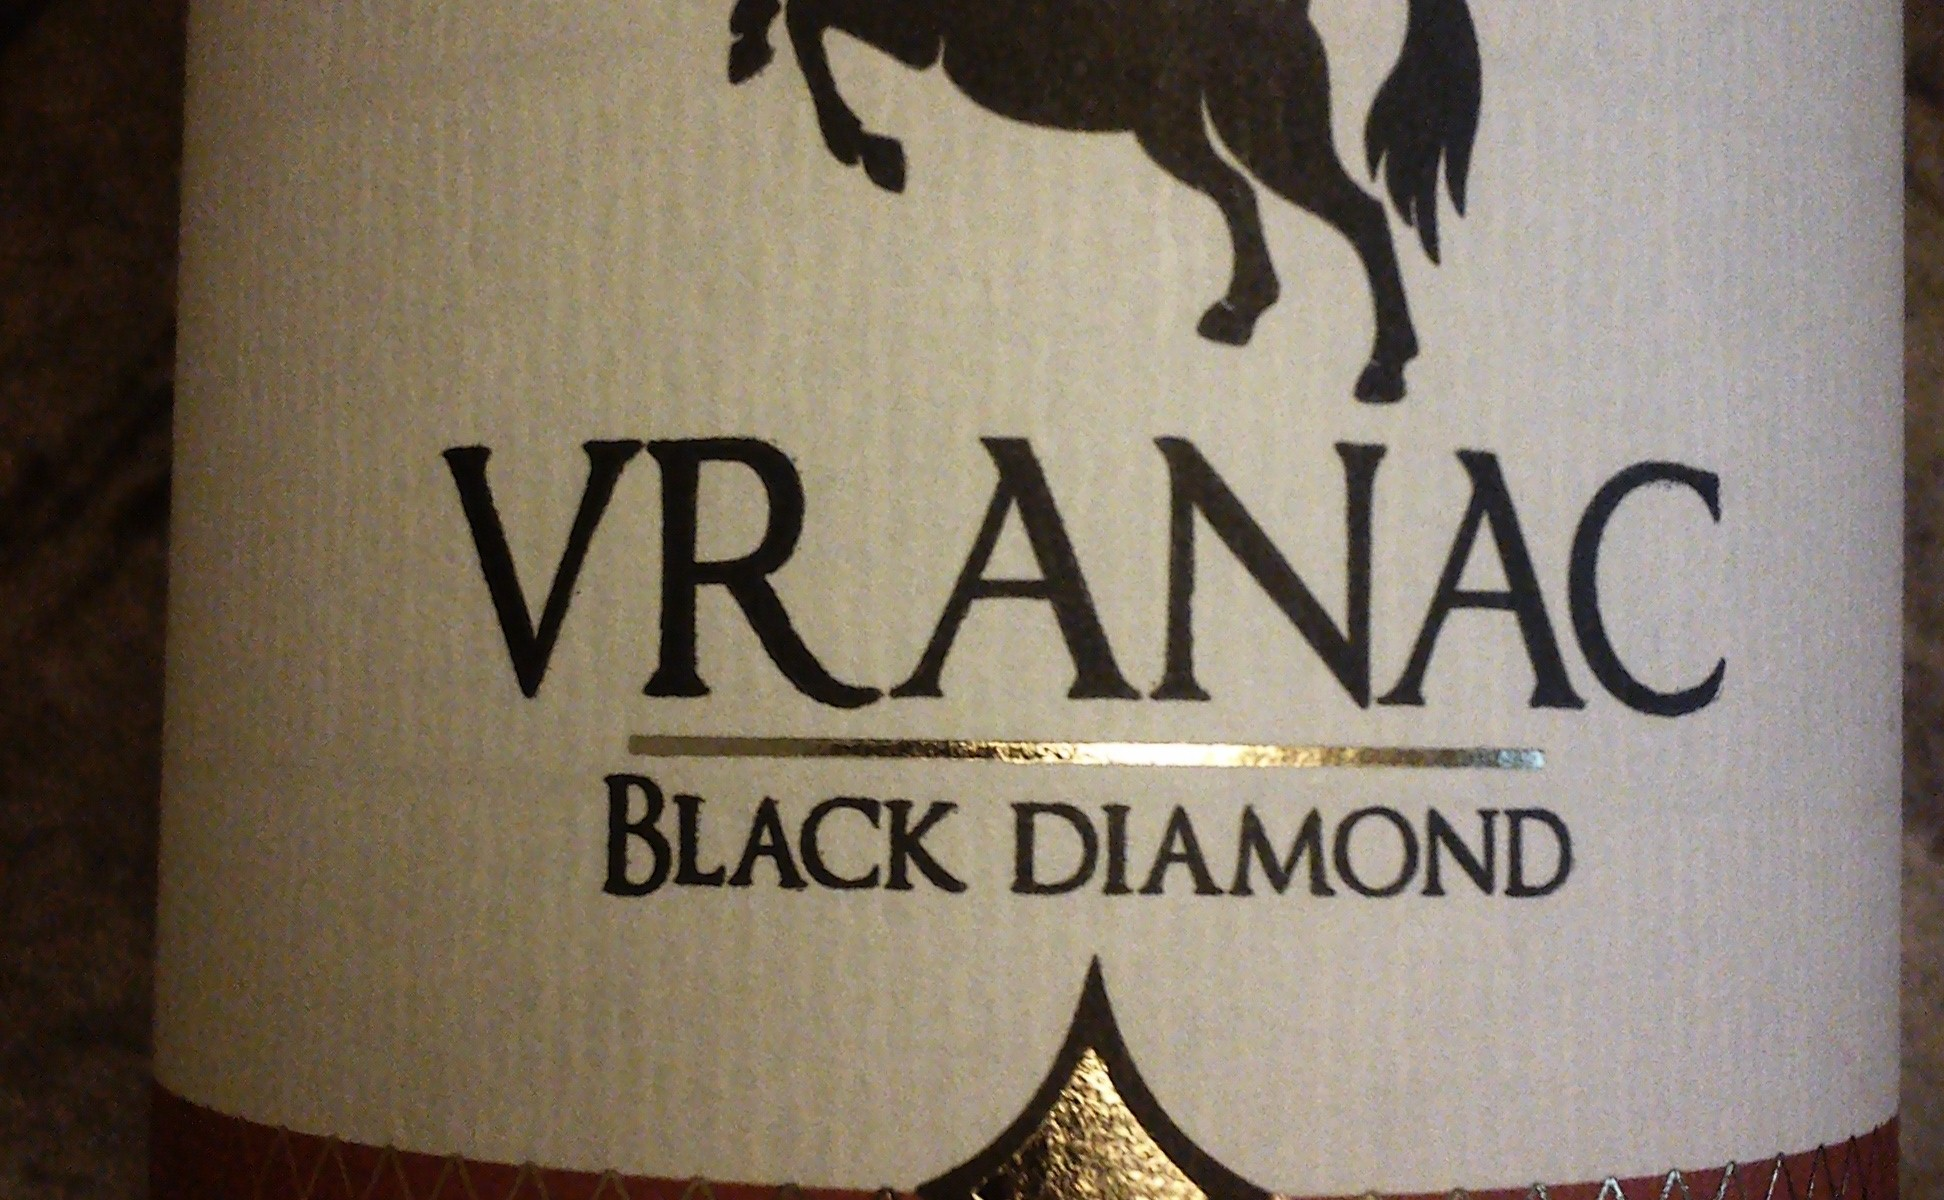 Vranac Black Diamond 2012